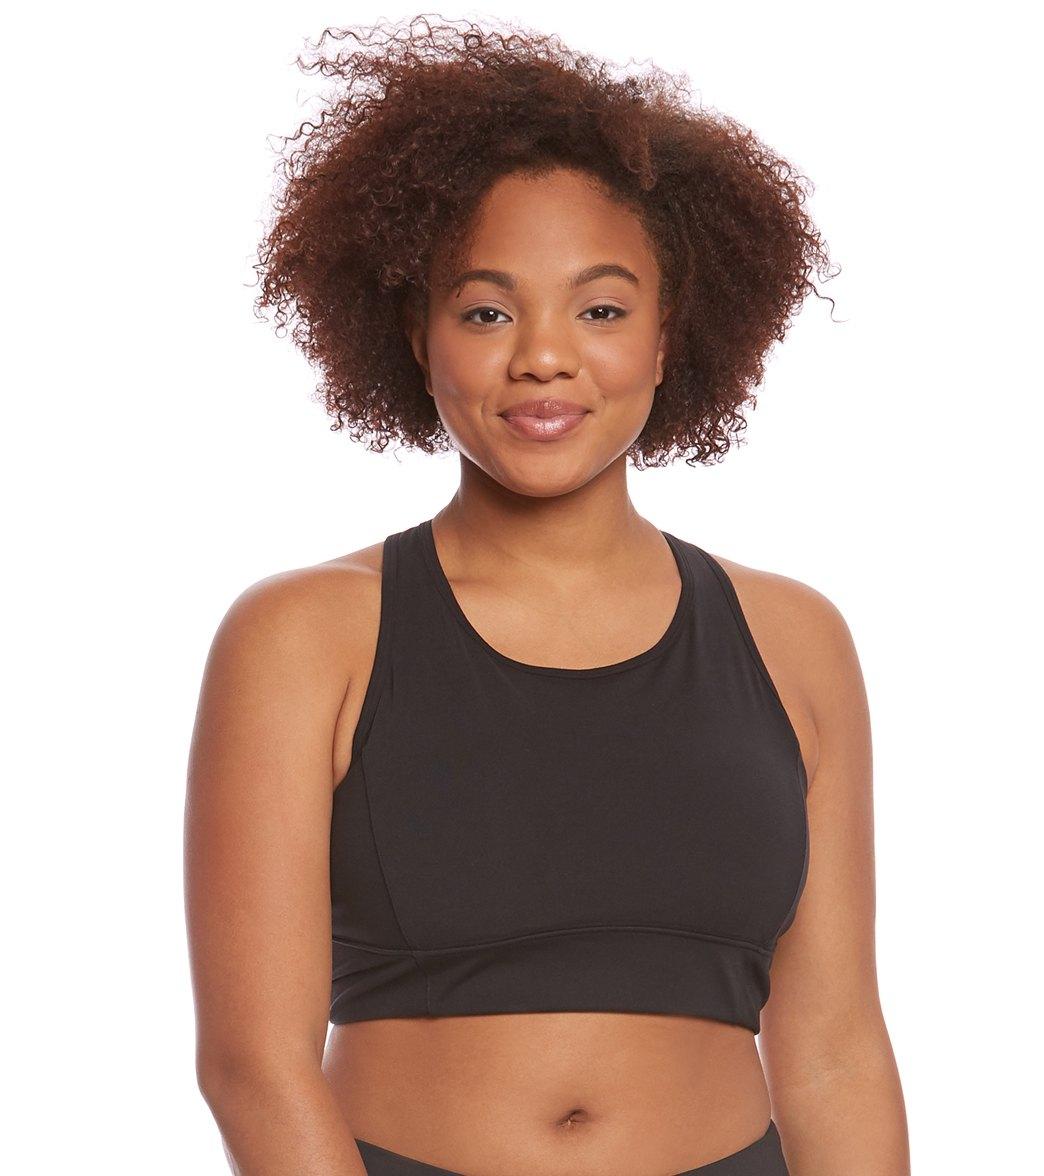 b95bbf7ea ... Lucy Women s Plus Size High Impact Workout Bra. Play Video. Play Video